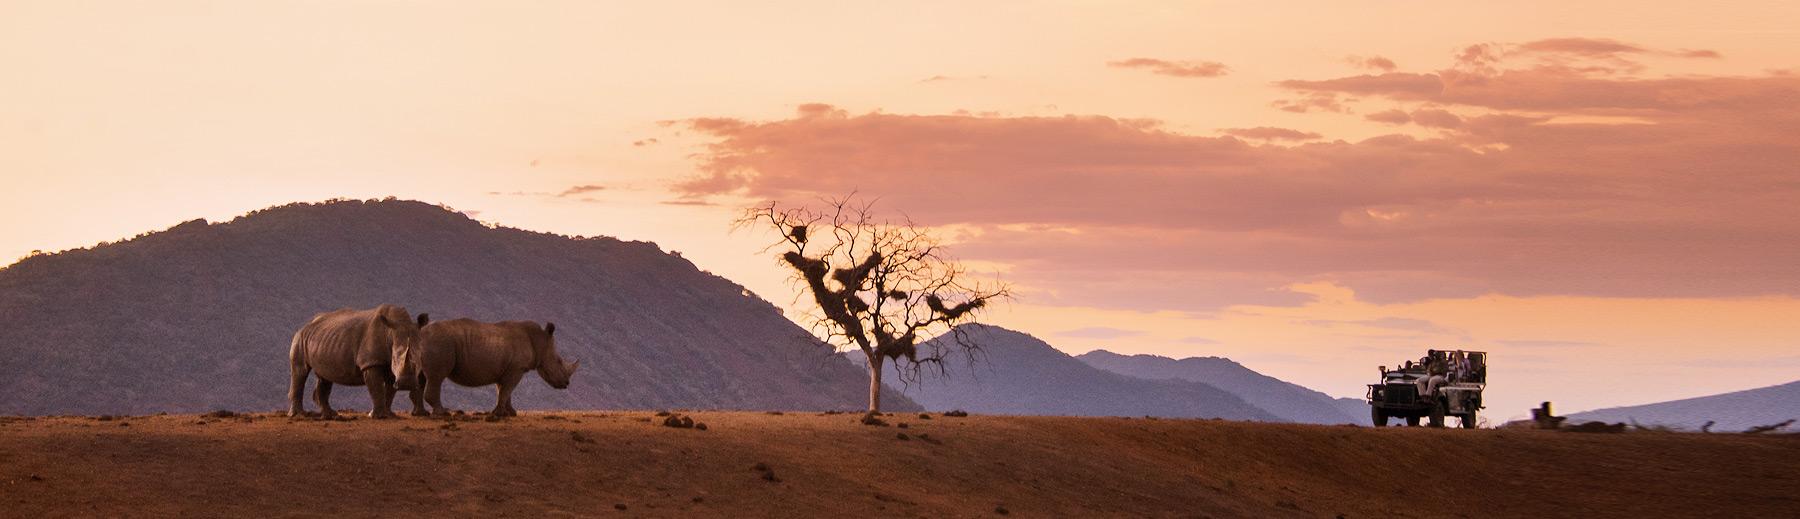 Travellers on a safari game drive spotting two rhino